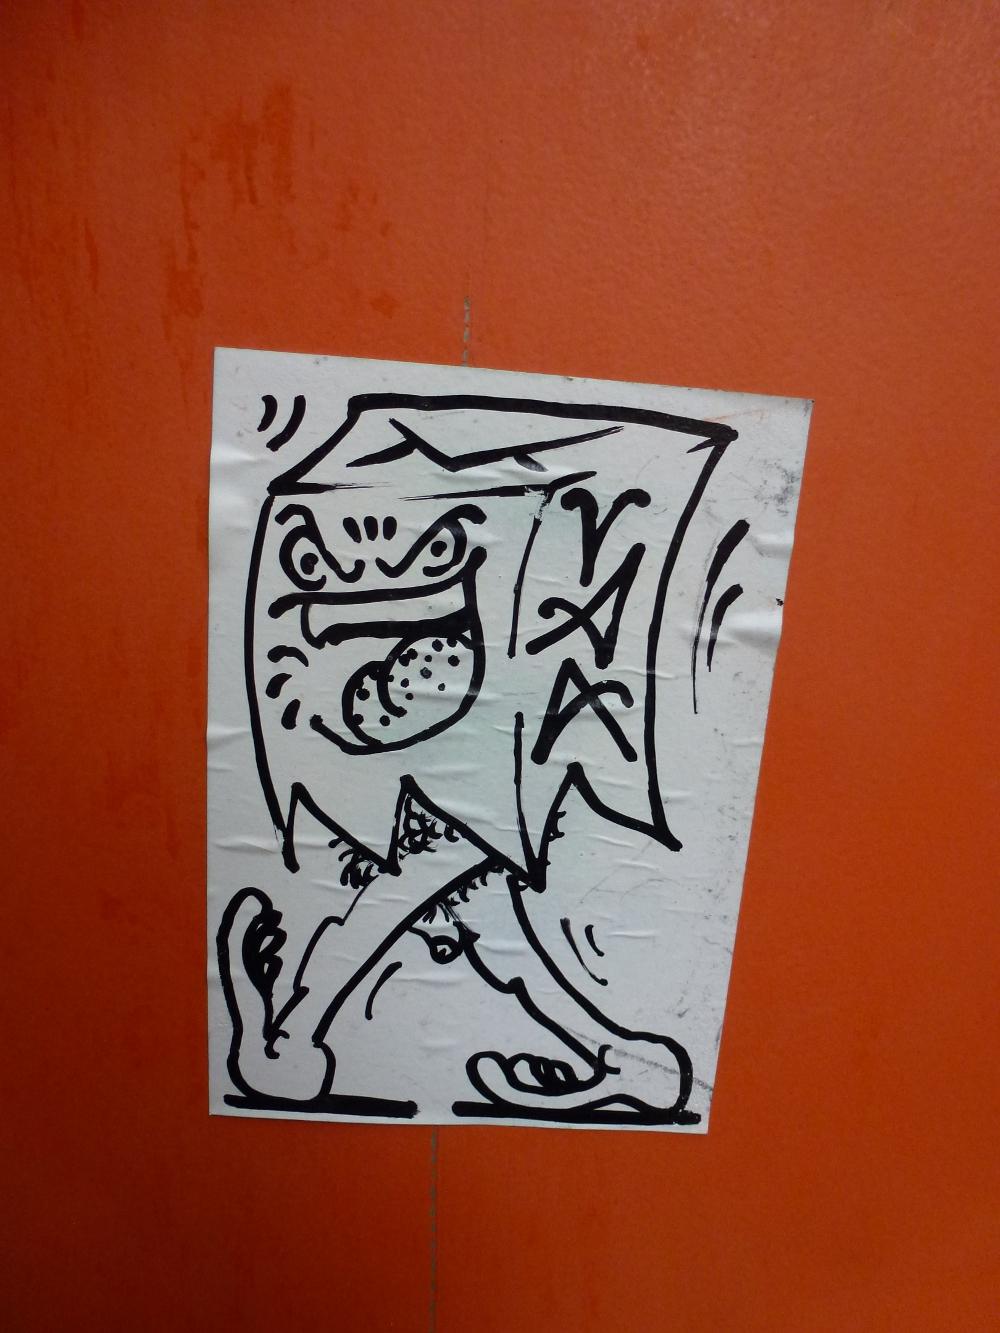 vaa - very ape art - im Tal in München